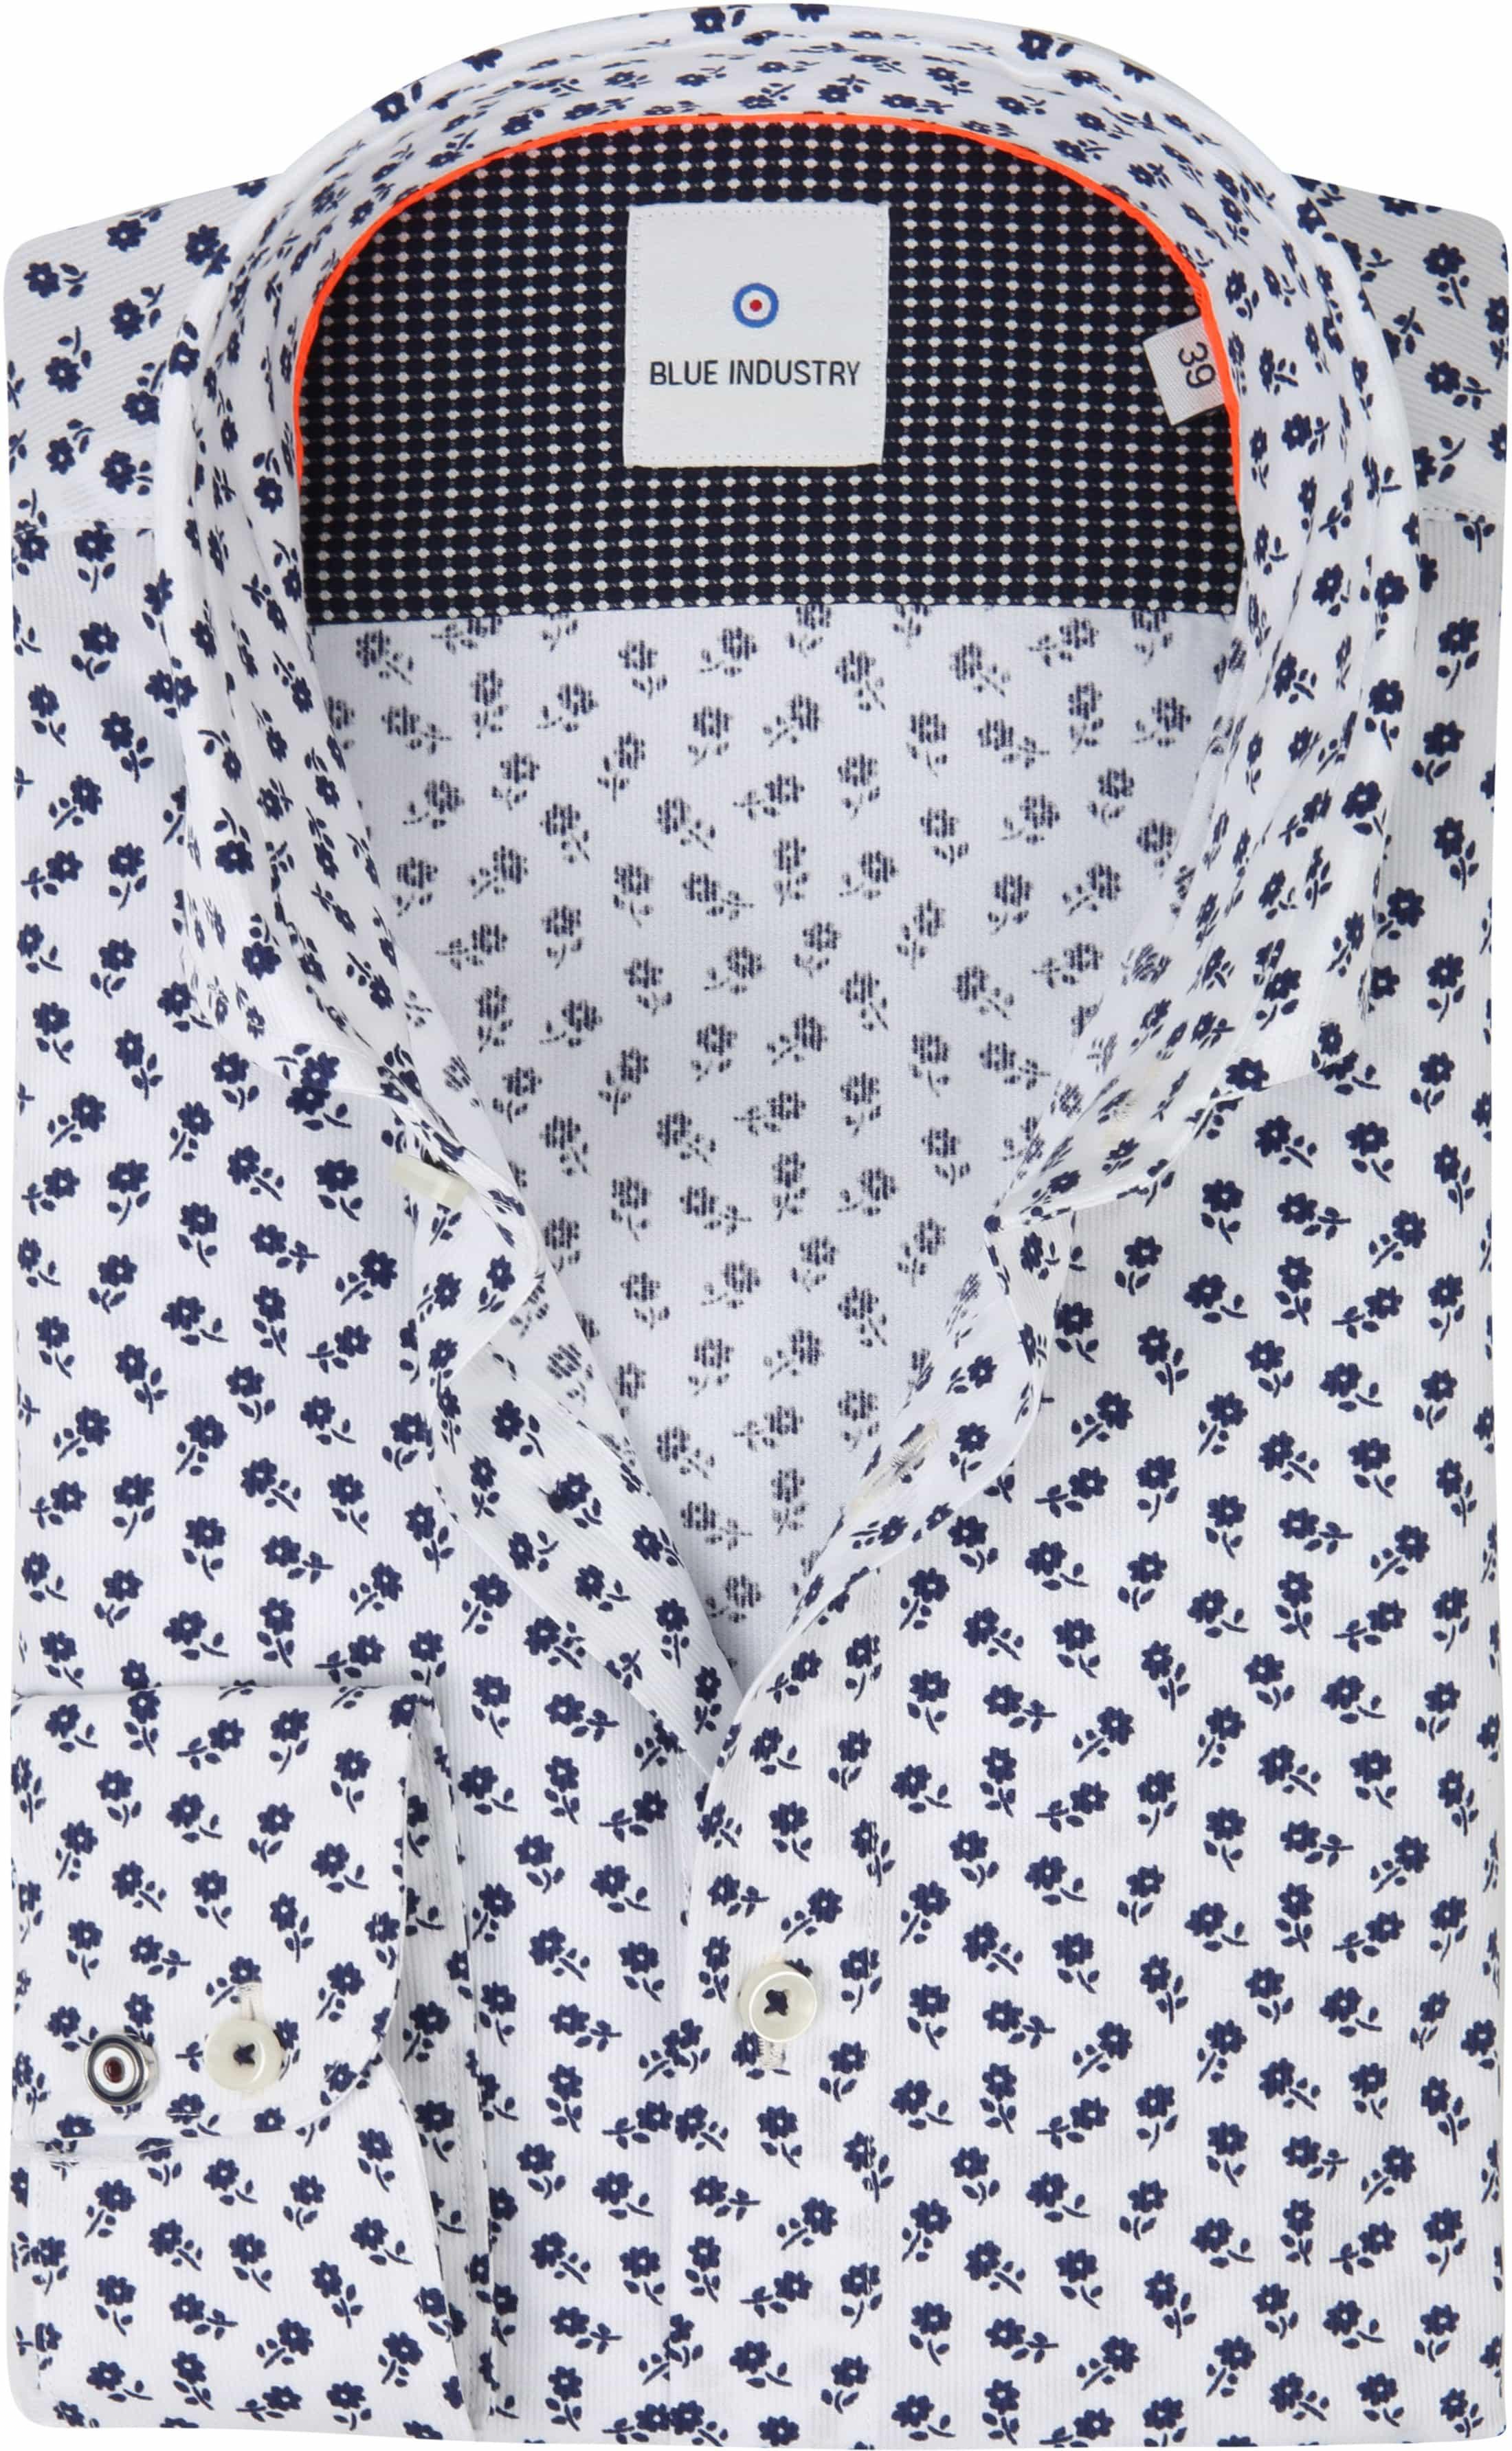 Blue Industry Overhemd Bloemen Wit foto 0